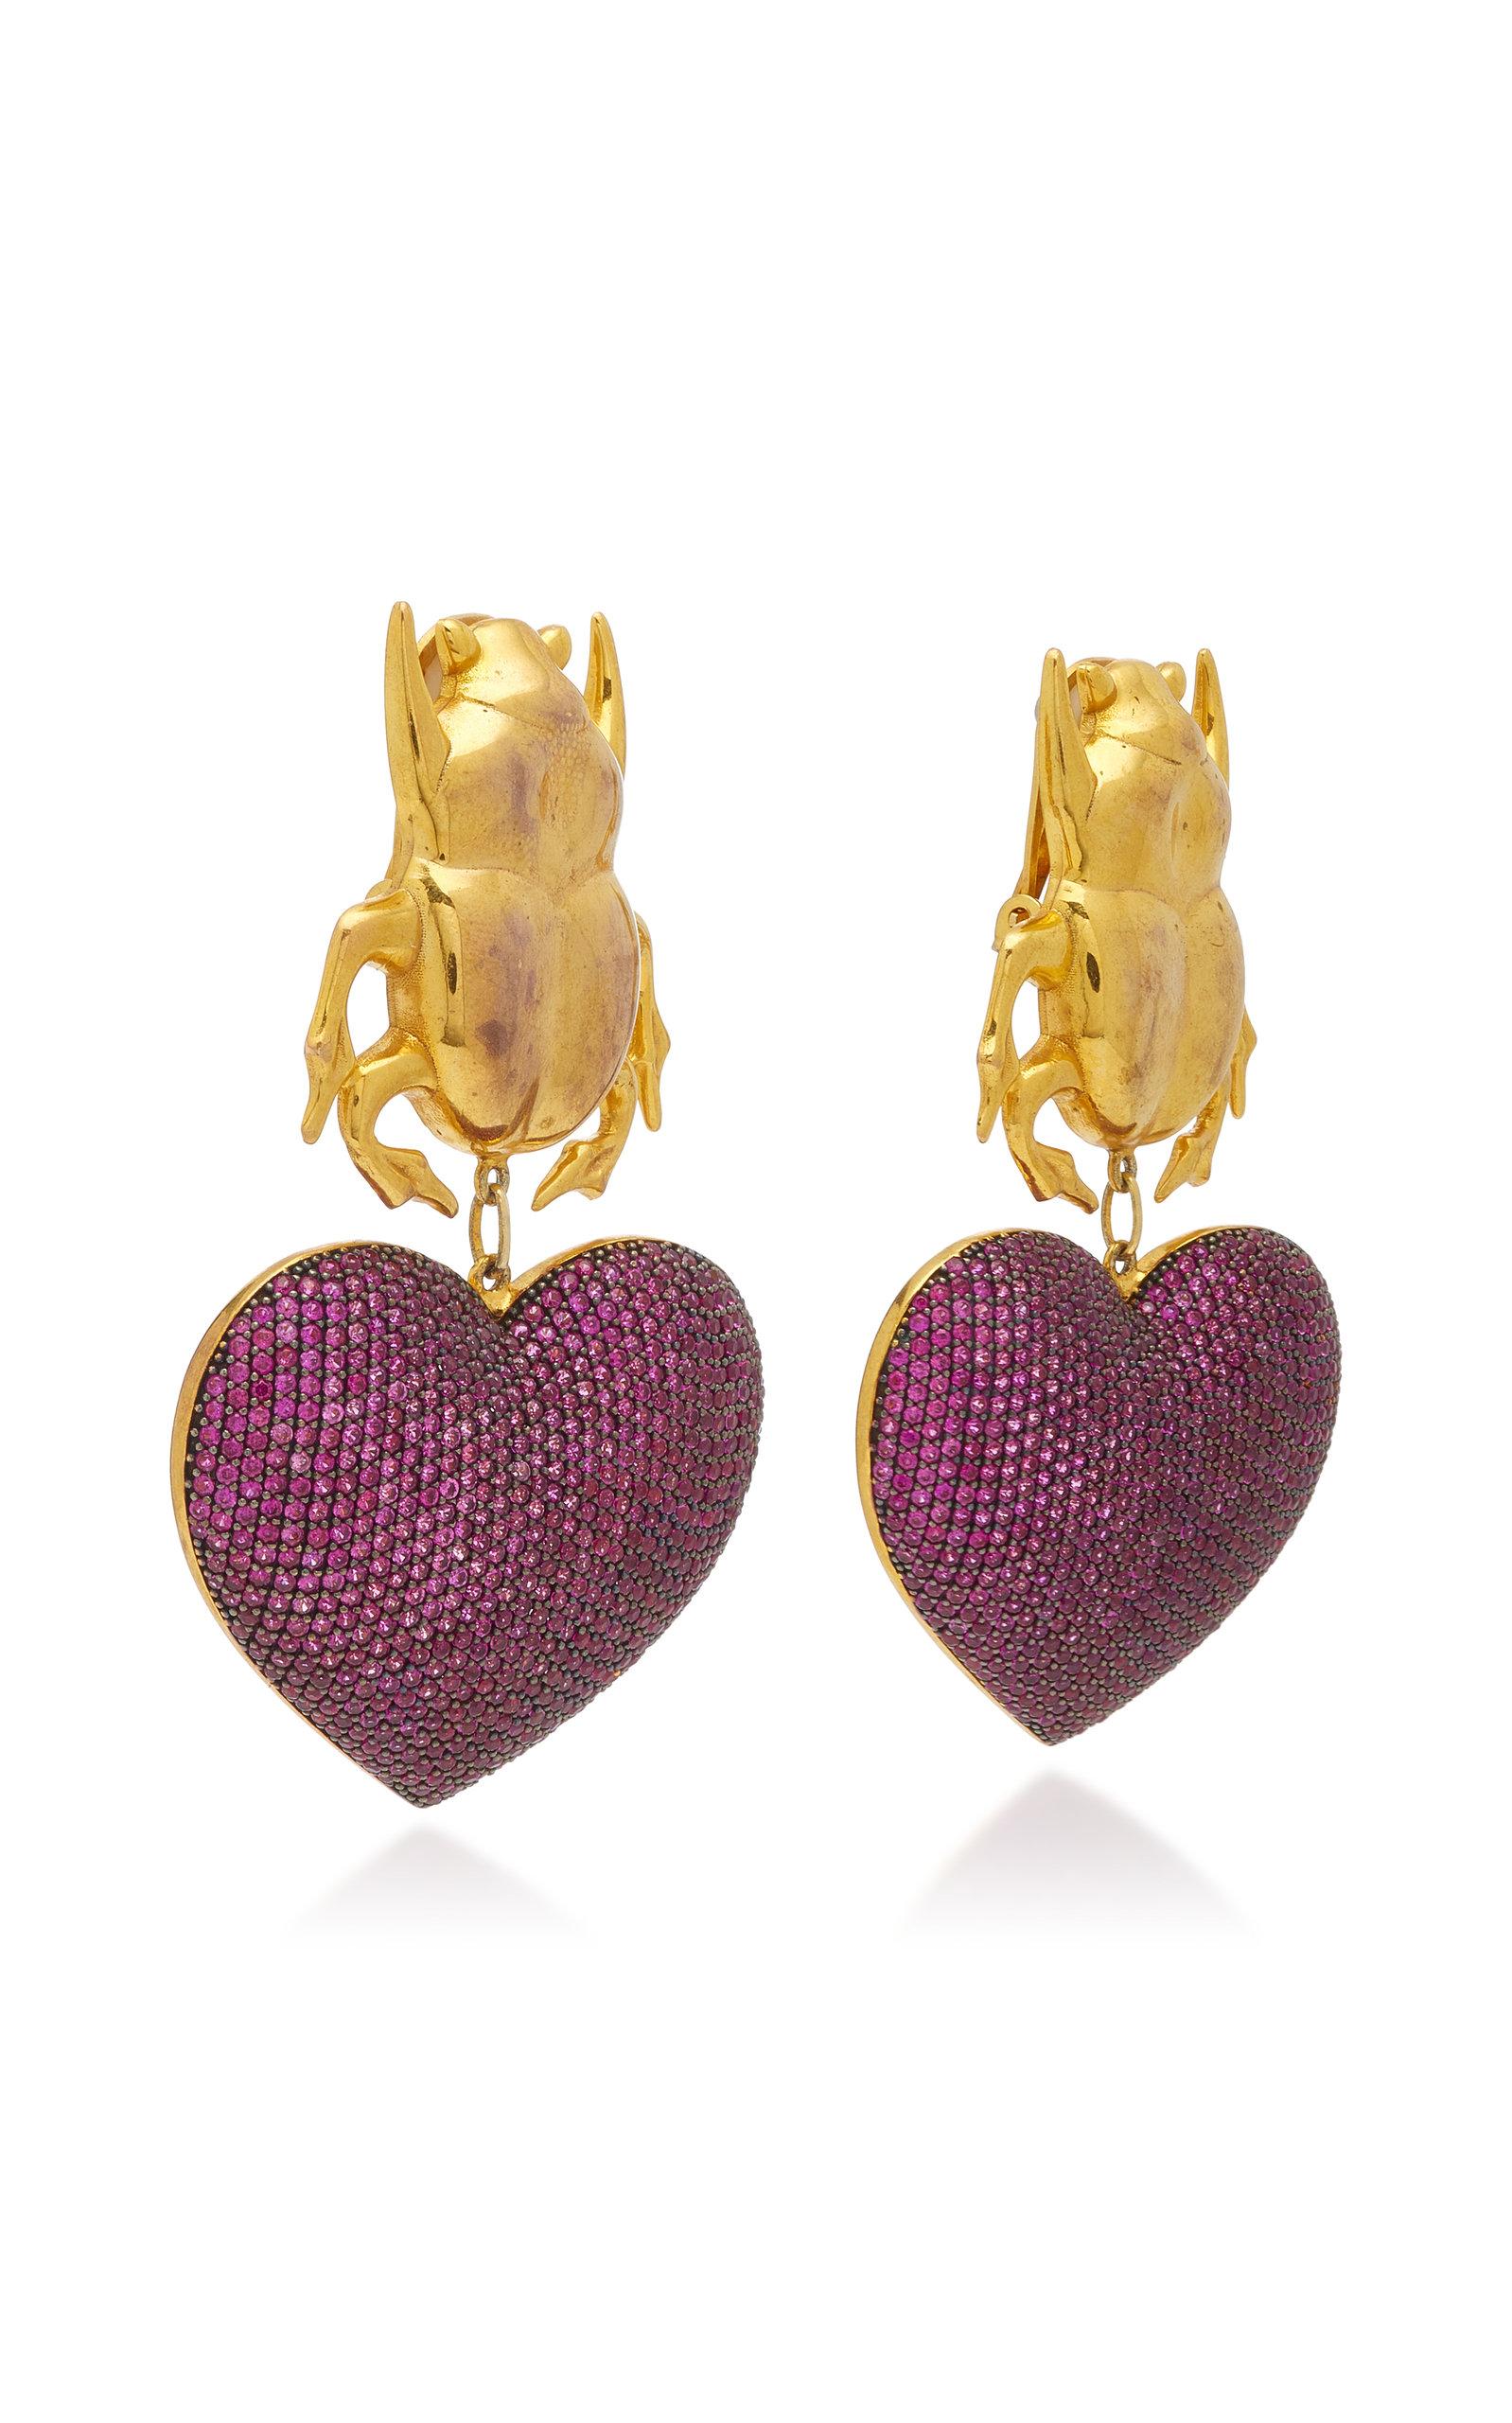 f2b53aa0bddc3 Beetle My Love Earrings